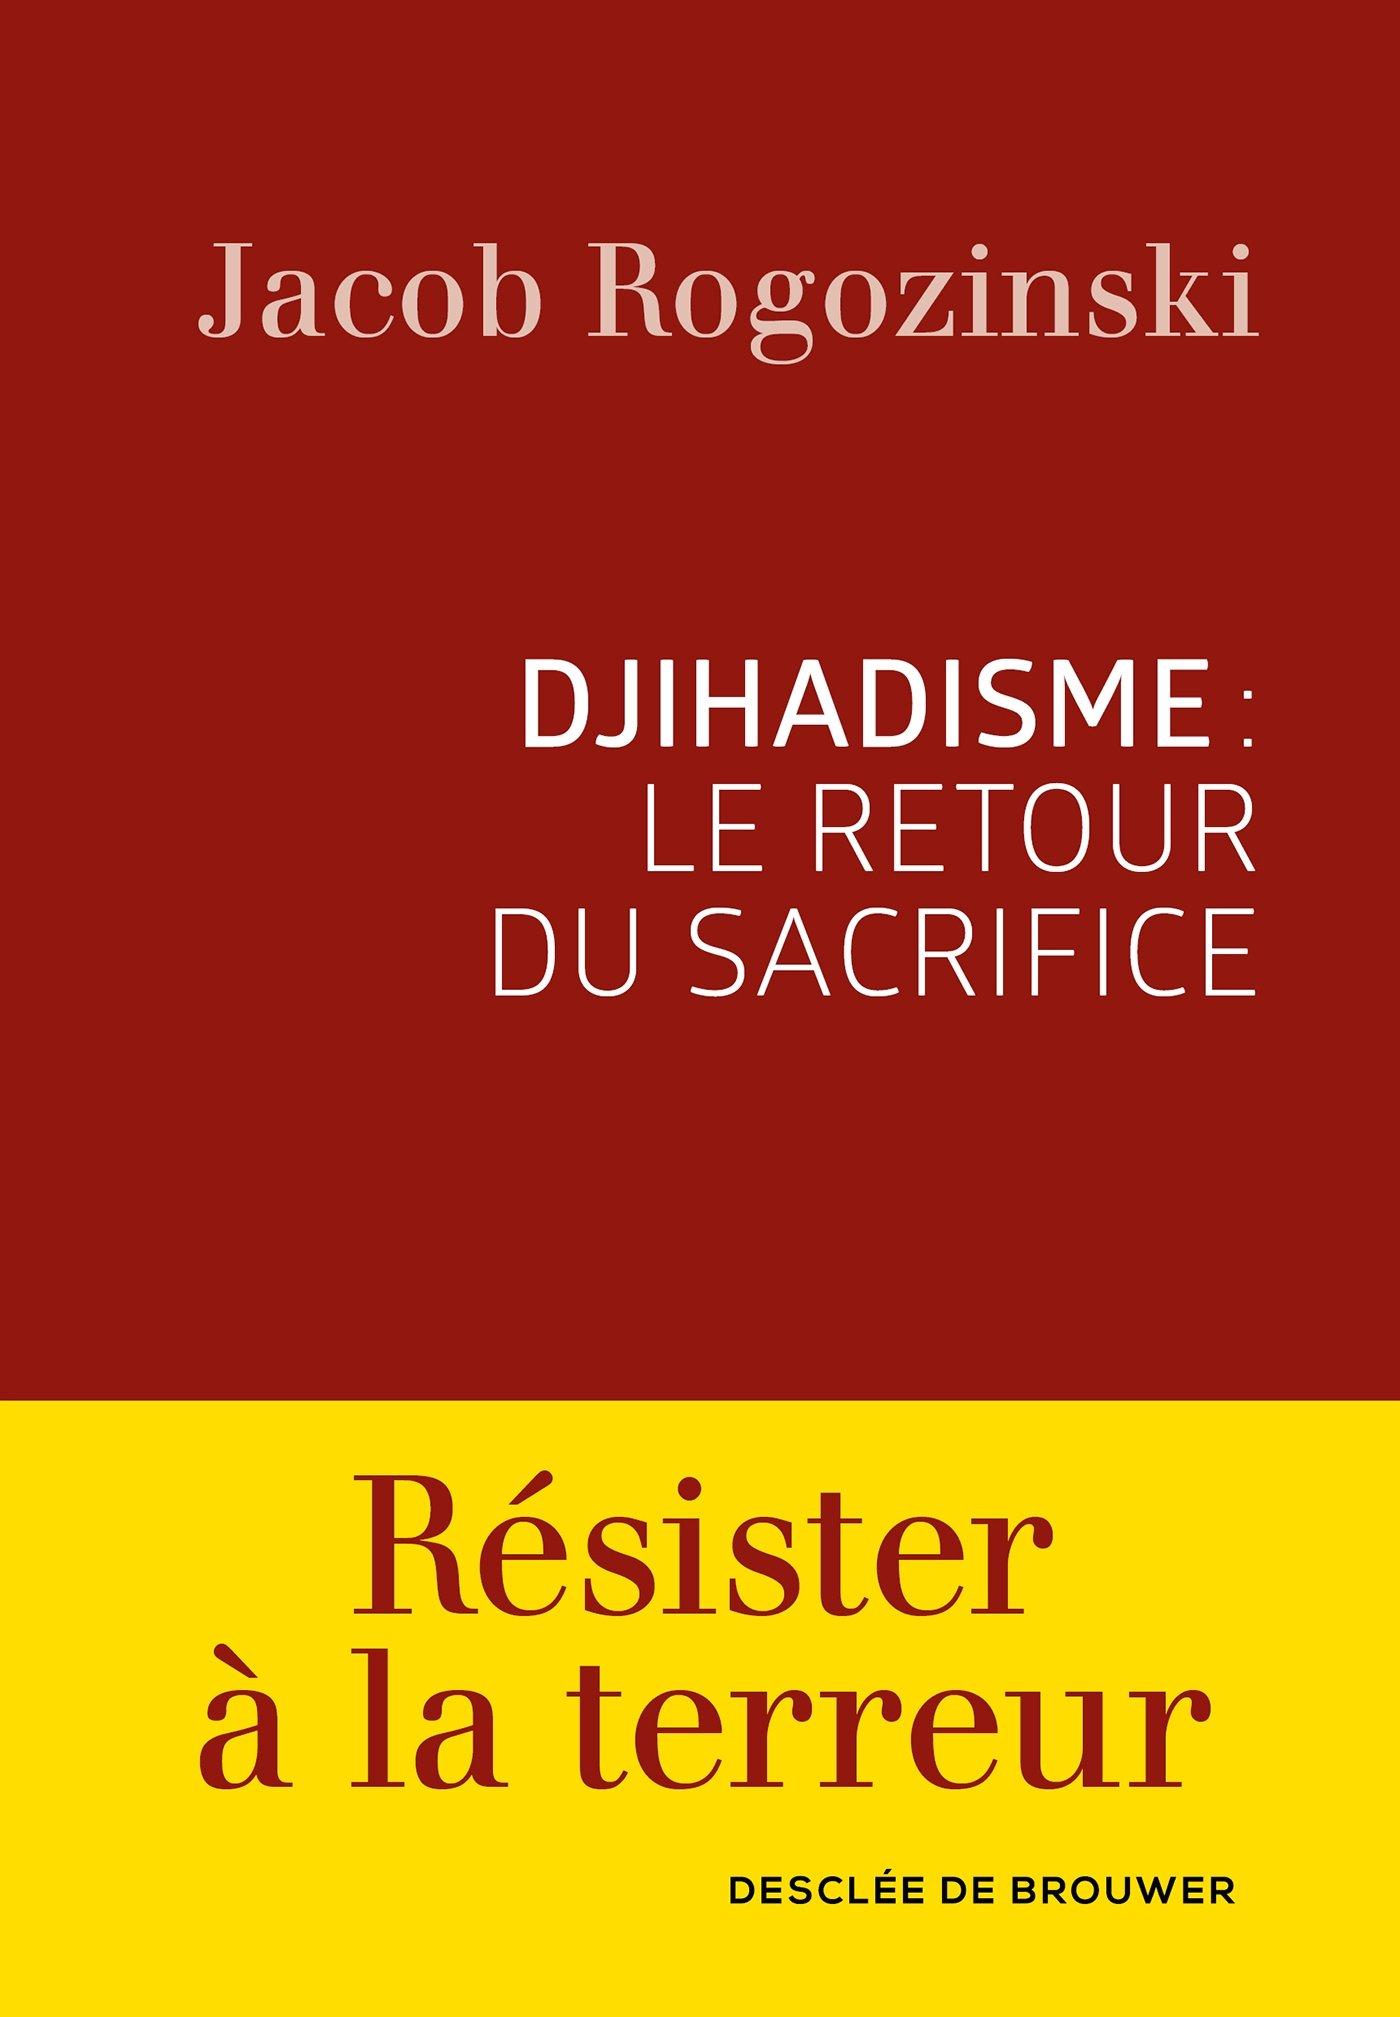 rogozinski_djihadisme_retour_du_sacrifice.jpg